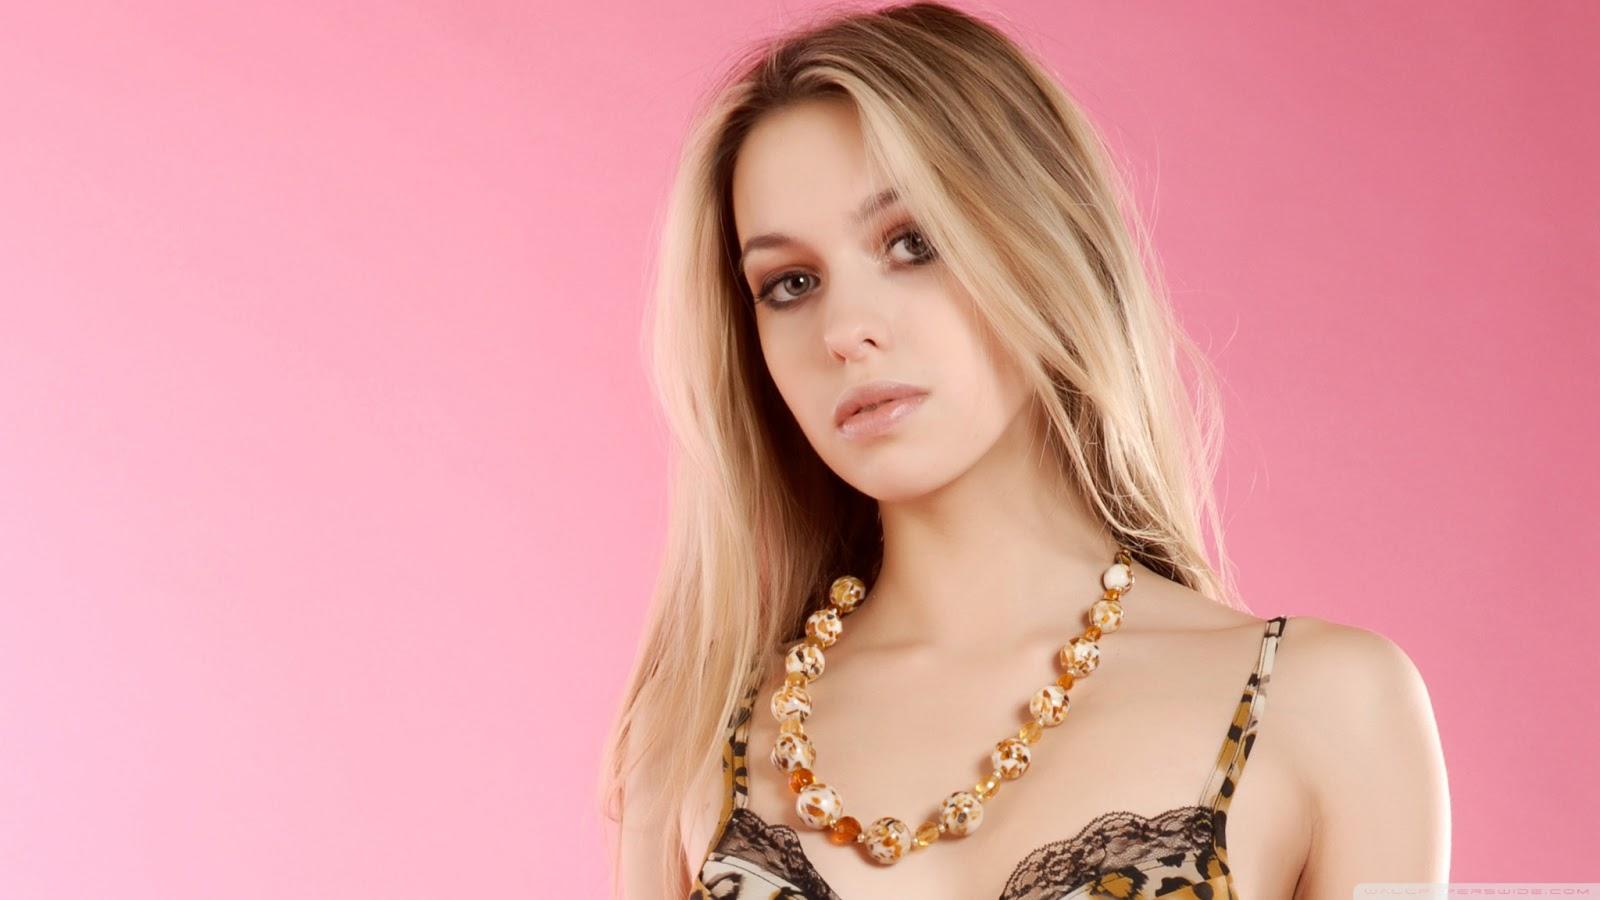 beautiful female celebrities wallpapers - photo #20